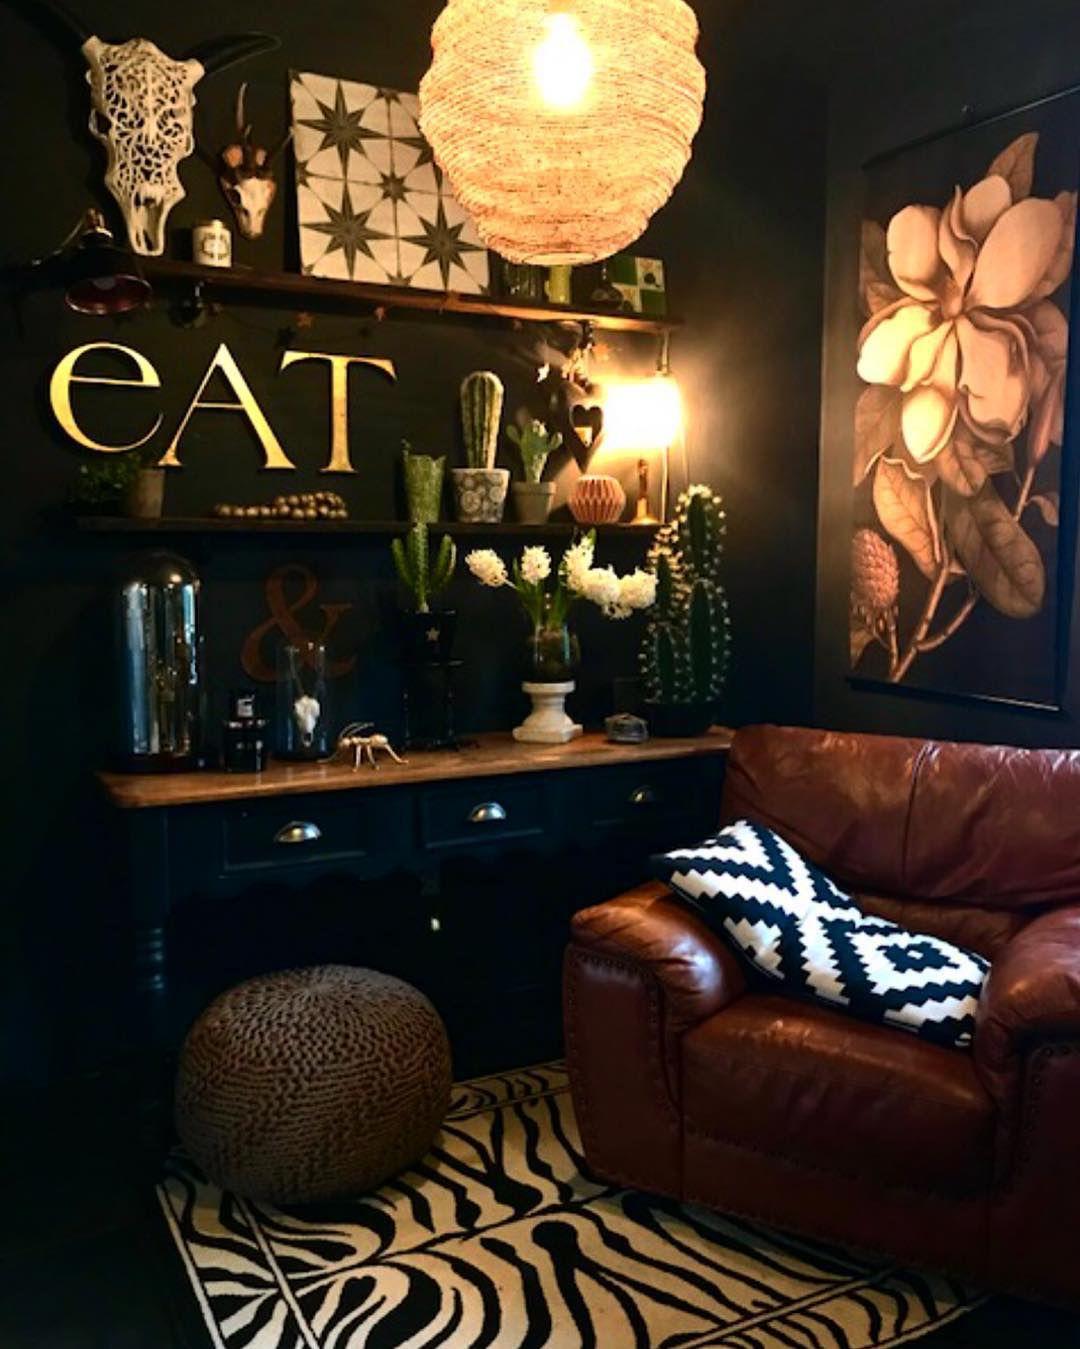 thuis woonkamer woonkamerdesign woonkamer decor donkere interieurs boho inrichting interieurontwerp voor